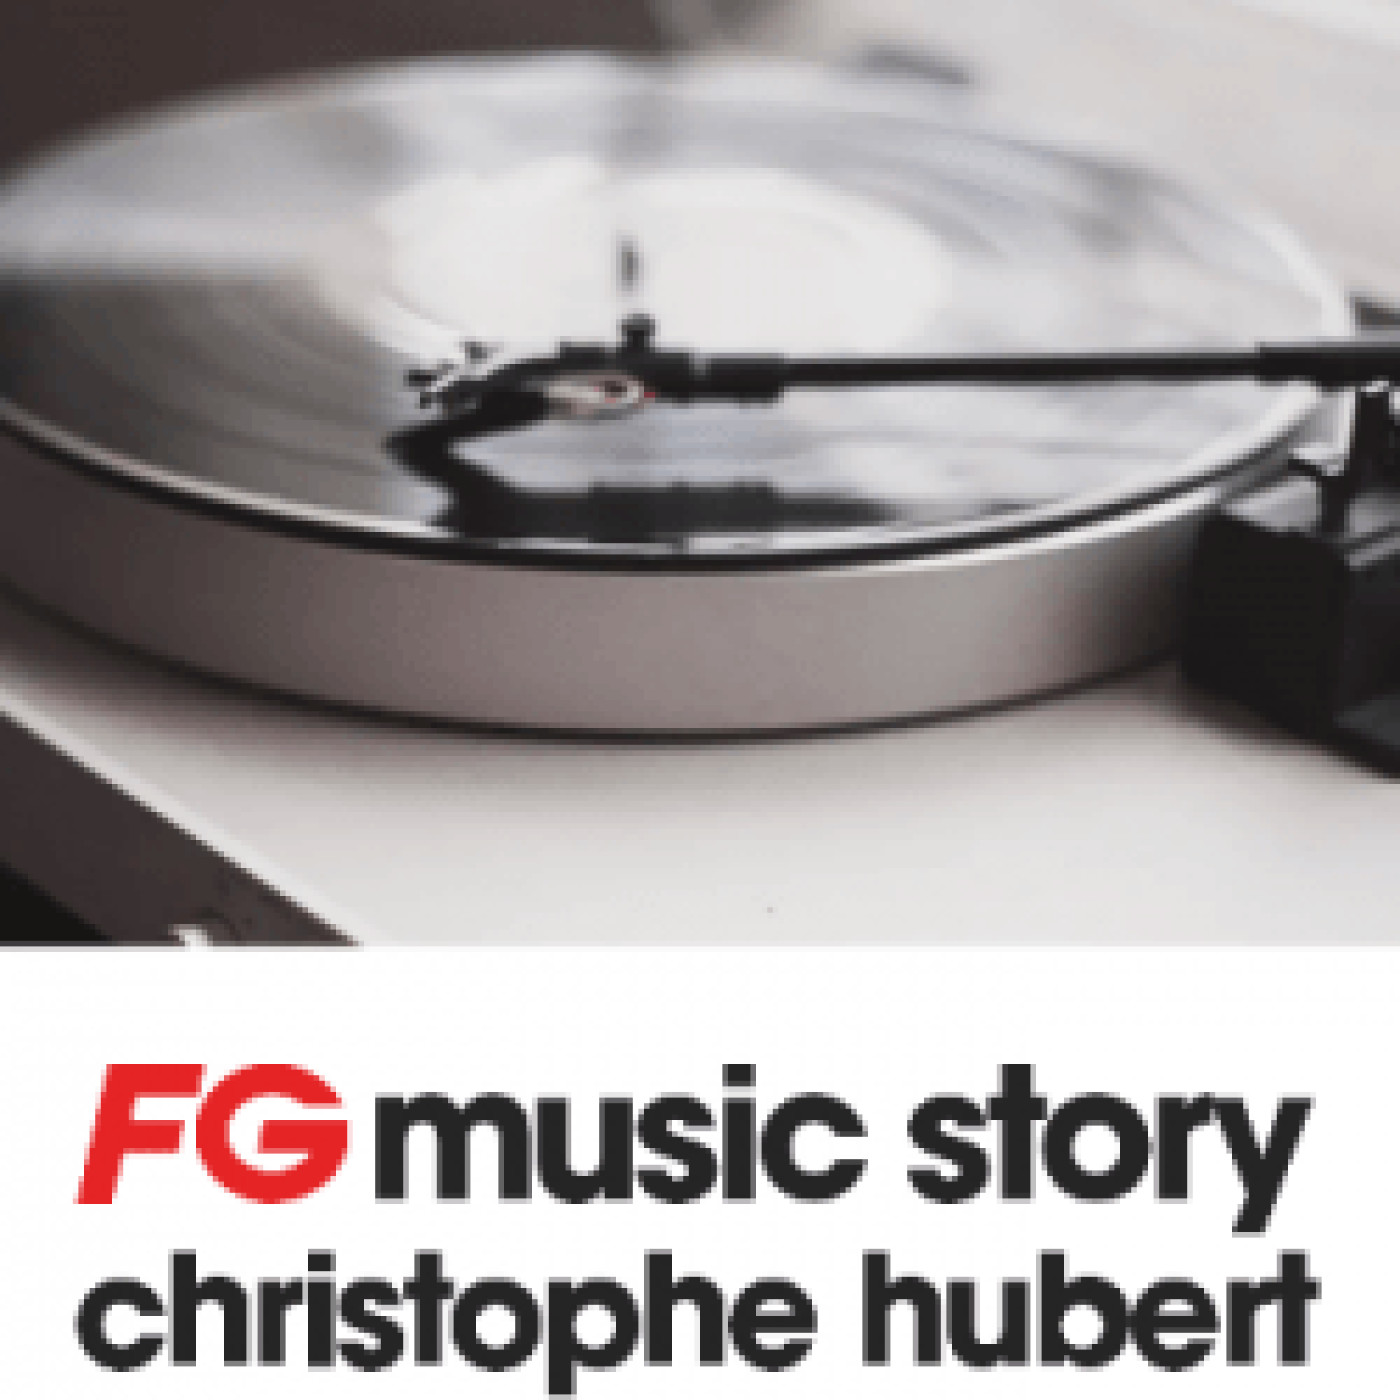 FG MUSIC STORY : DISCOPOLIS MEDUZA REMIX